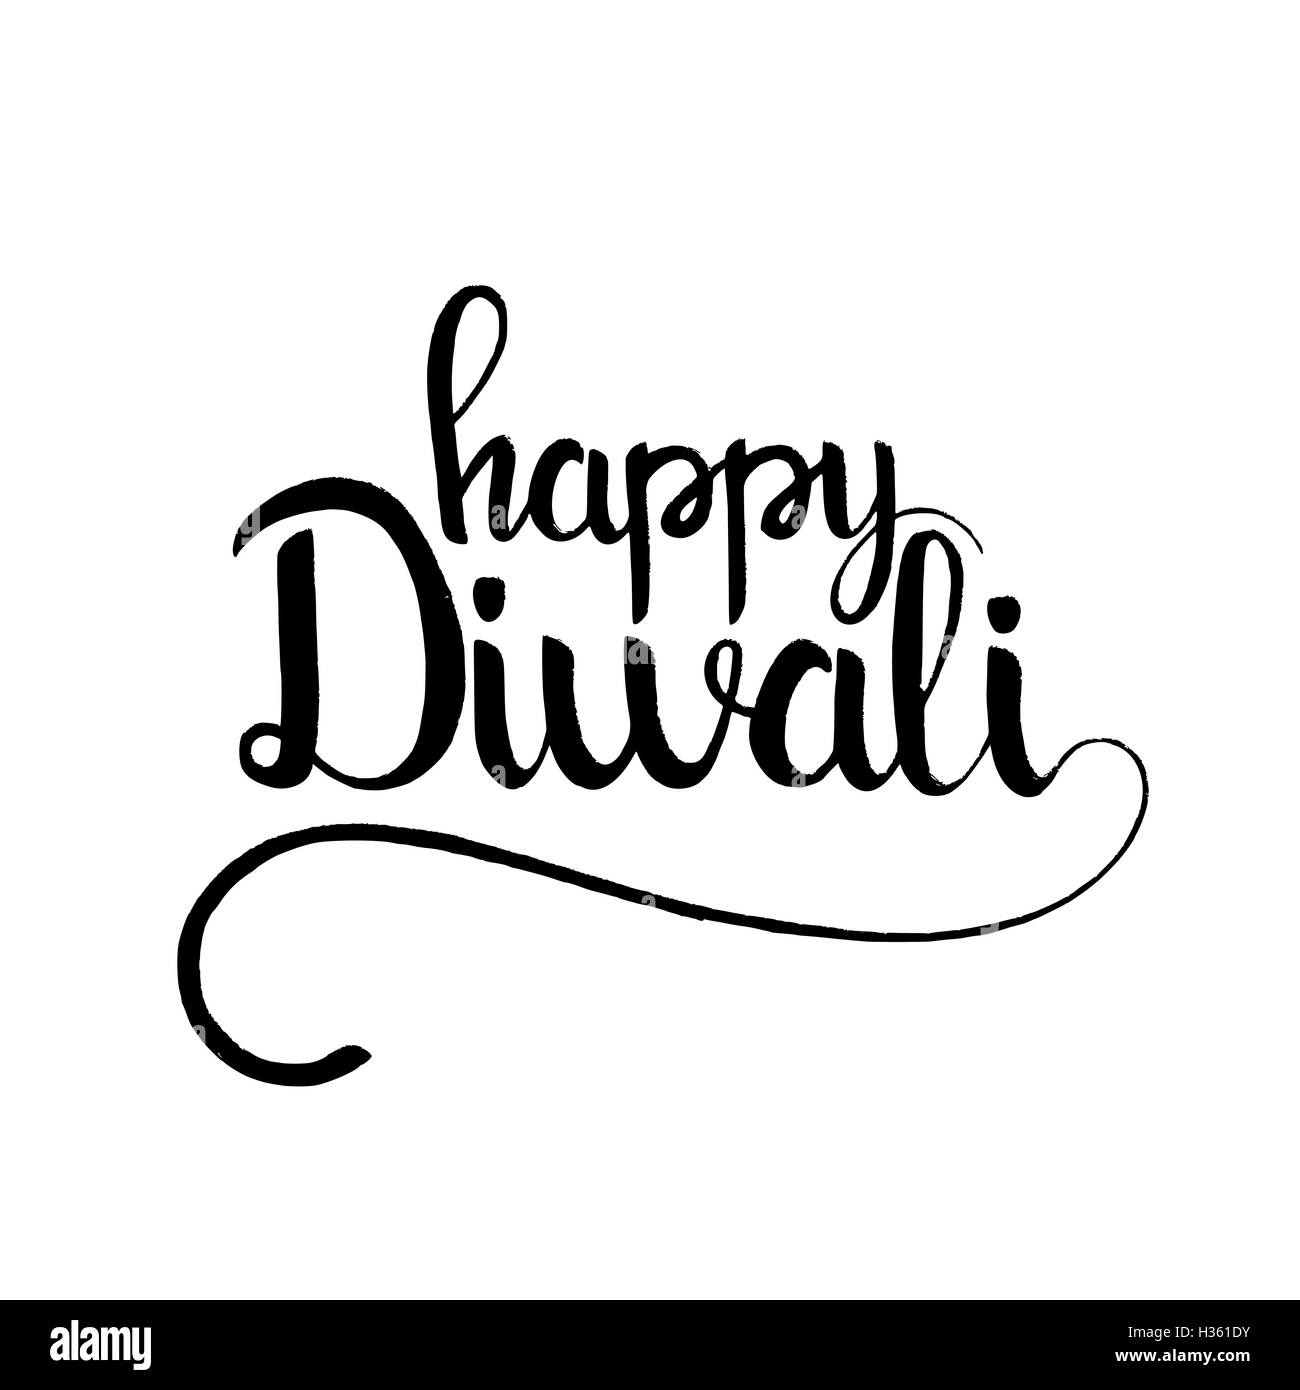 Happy diwali lettering modern vector hand drawn